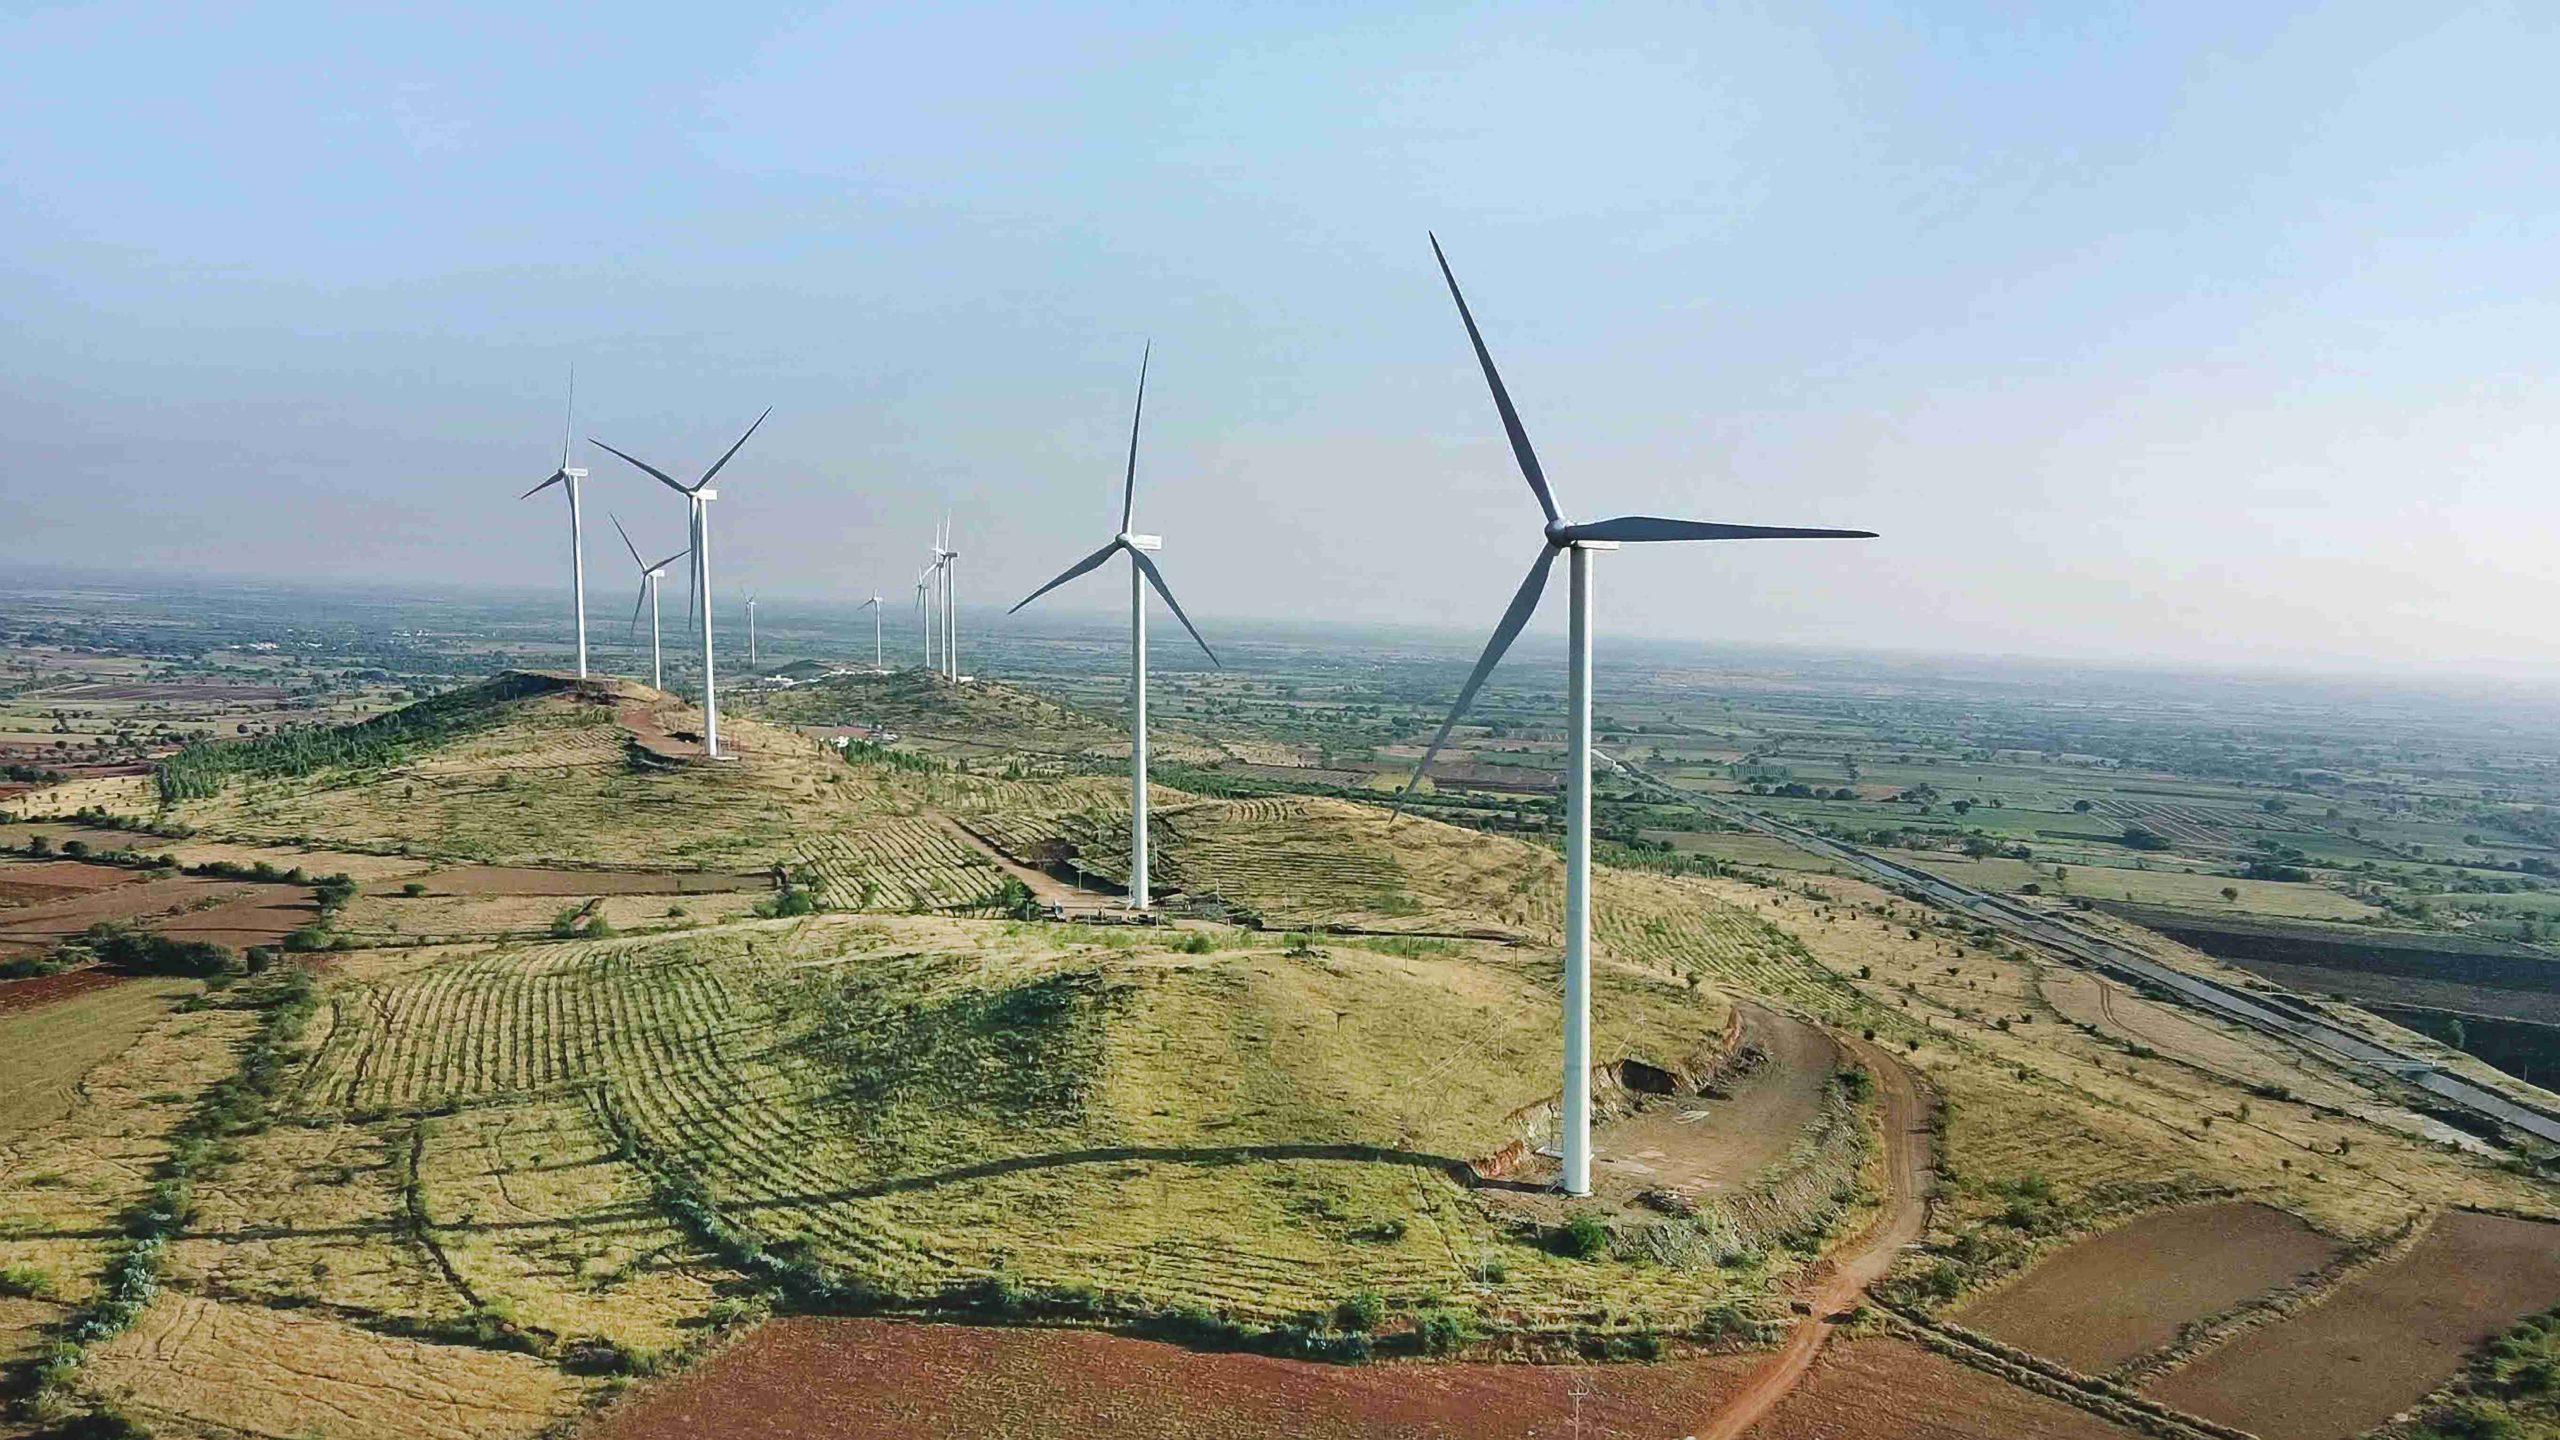 CLIMATE INVESTOR ONE ADDS 38 MW OF RENEWABLE ENERGY CAPACITY IN KARNATAKA